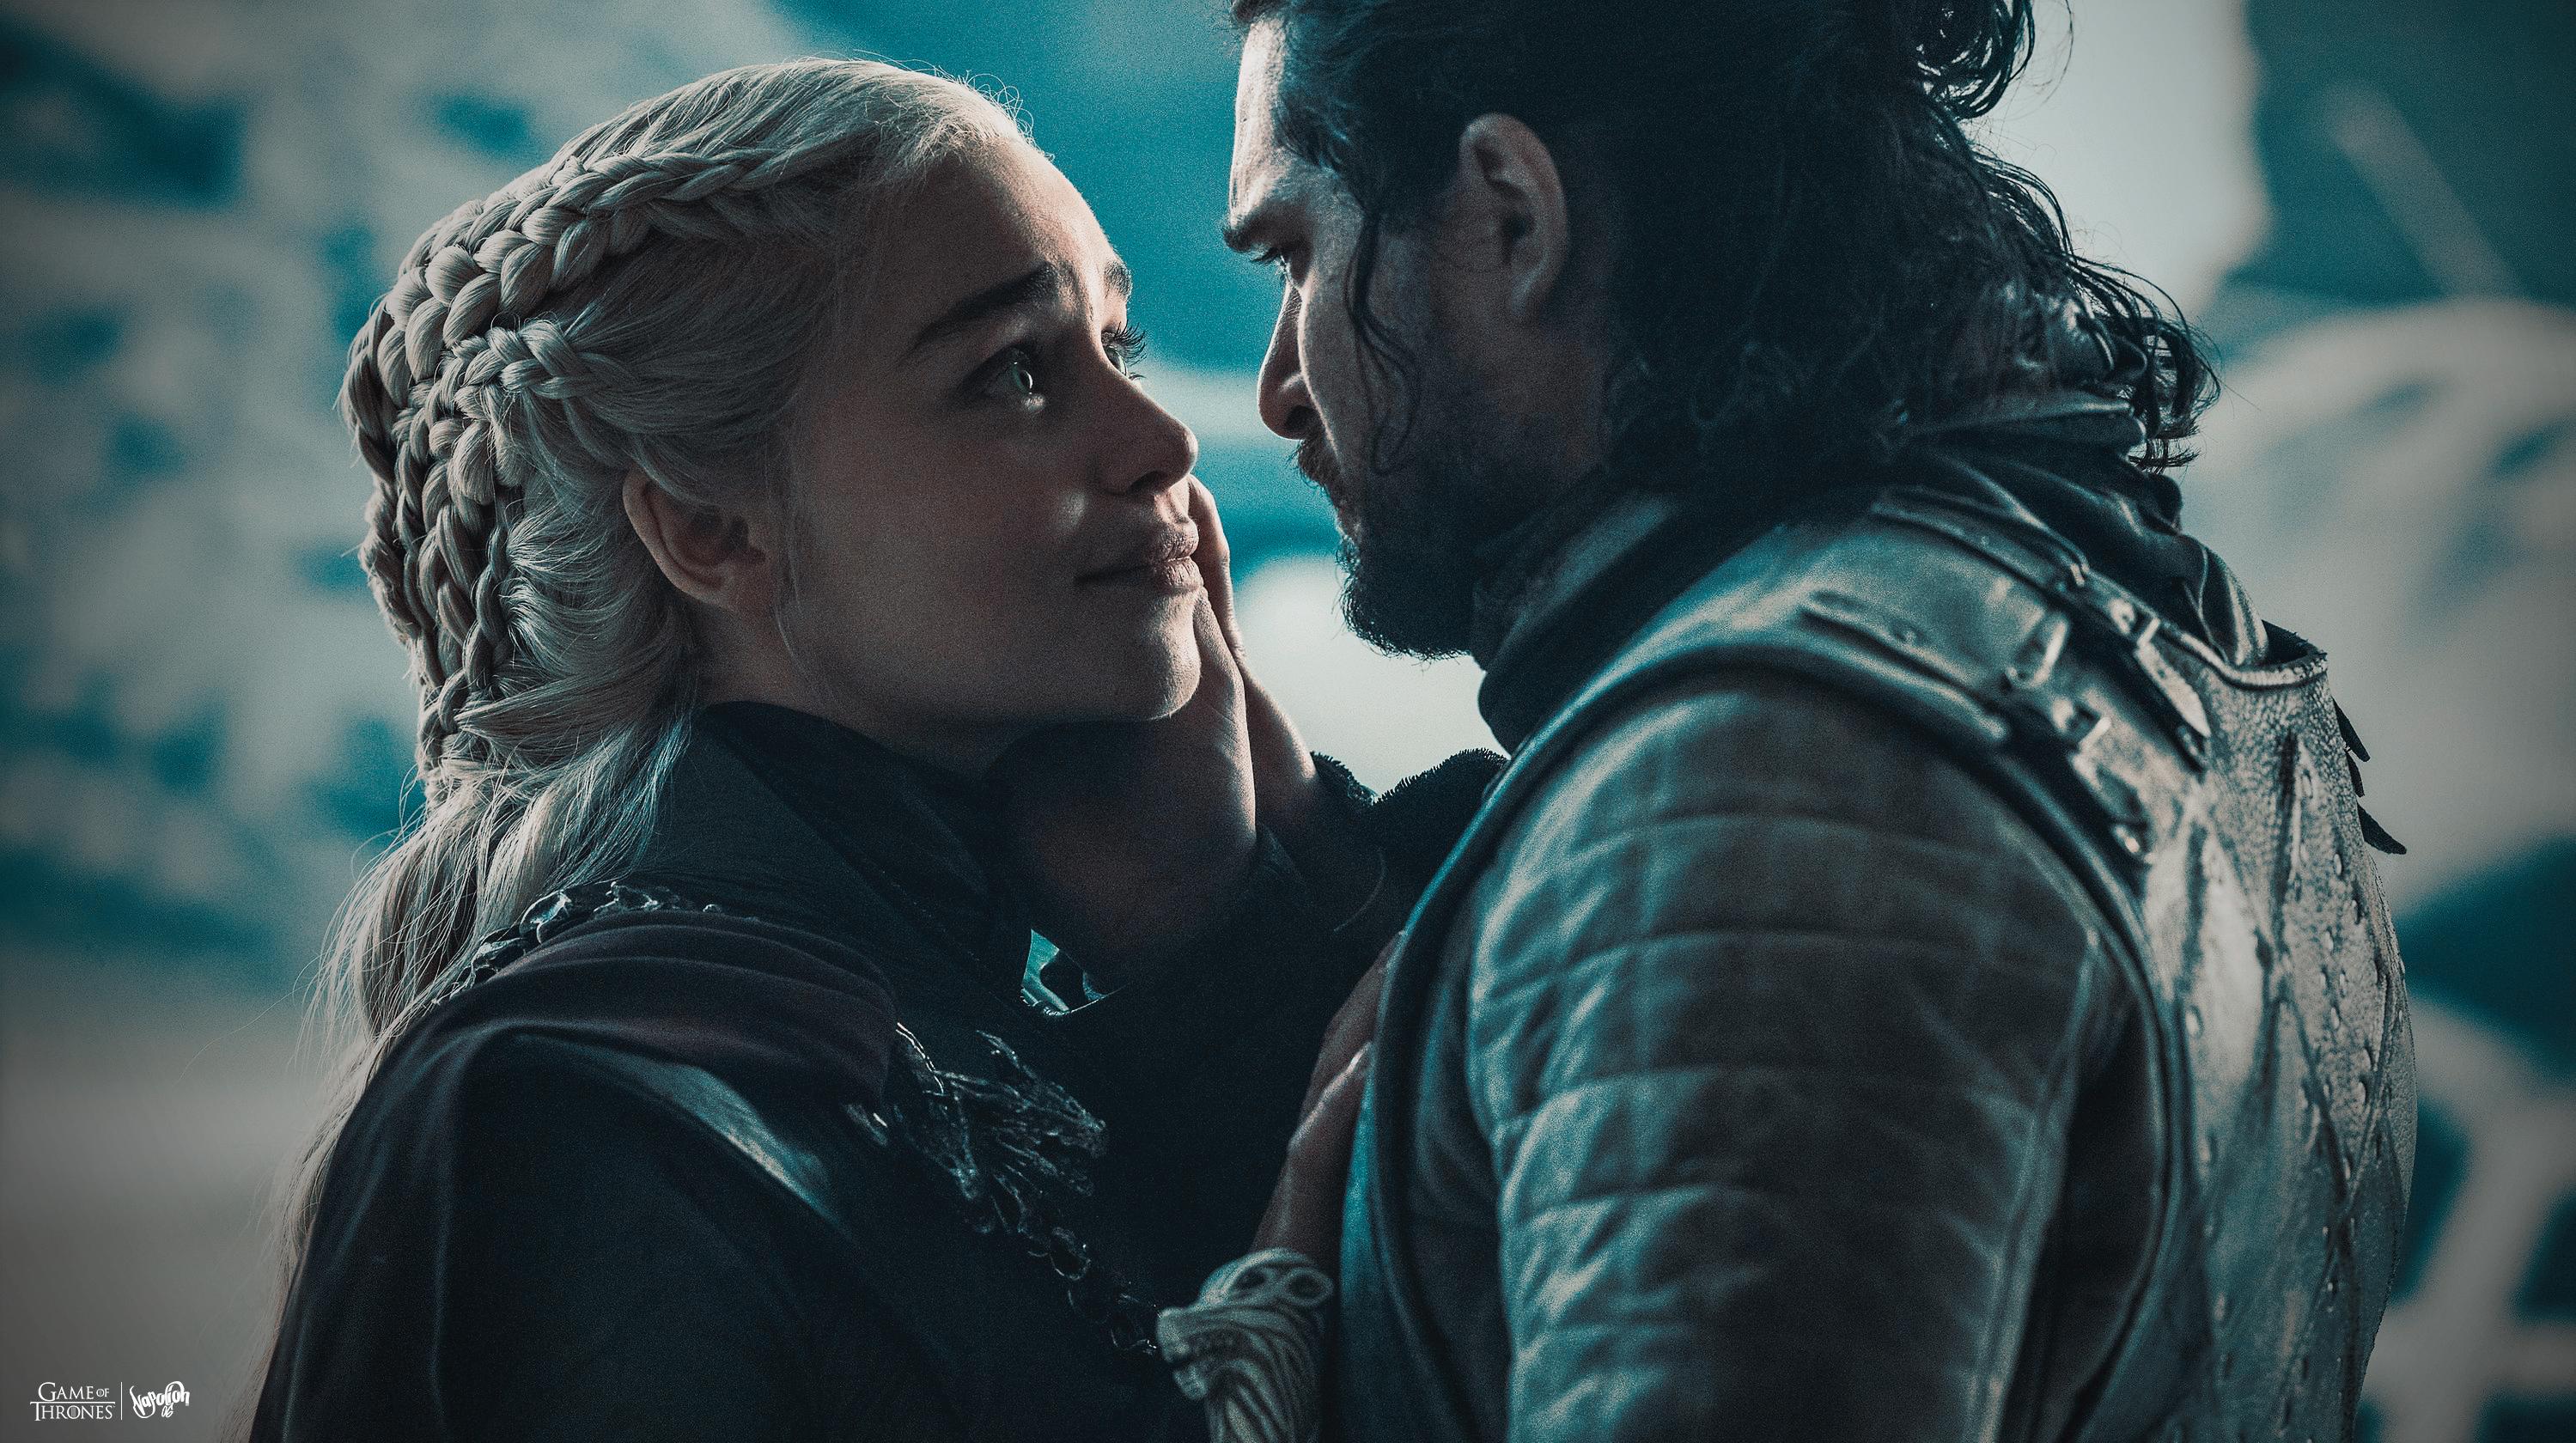 Daenerys Targaryen Jon Snow Wallpaper By Napolion06 On Deviantart